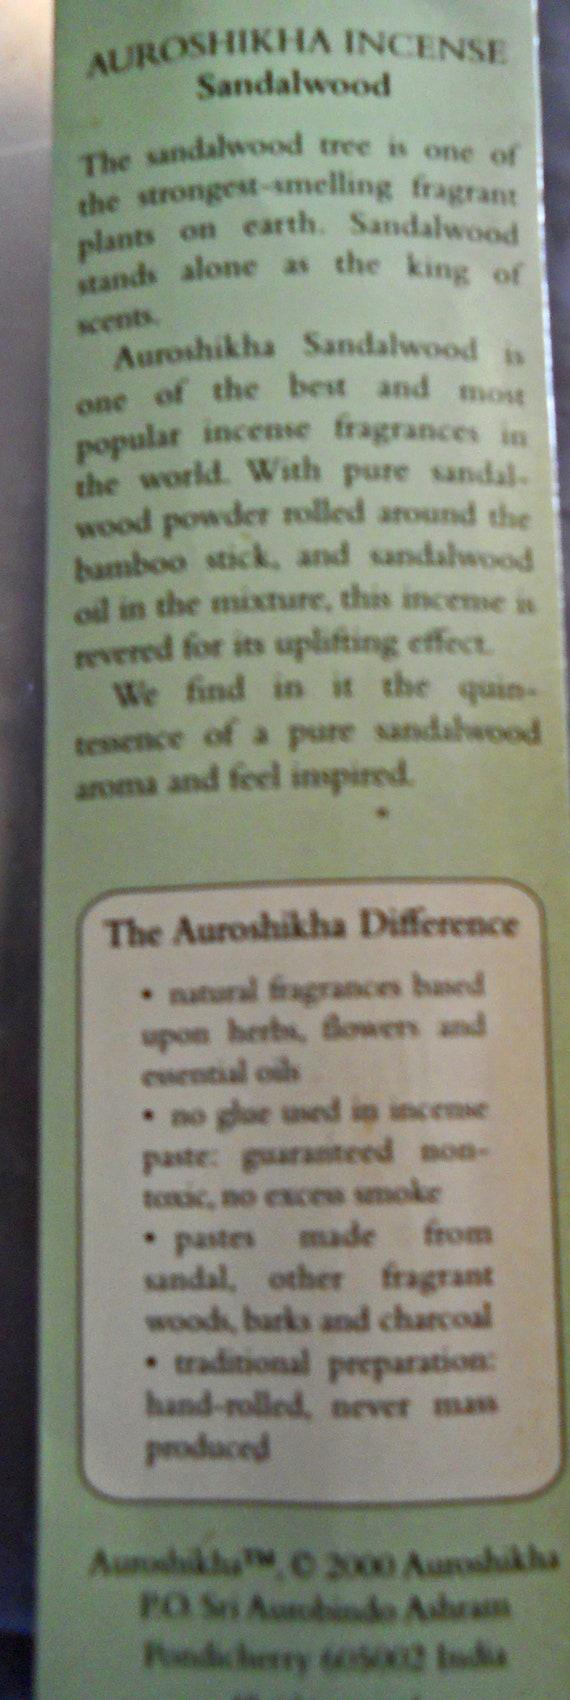 Incense sticks all natural incense sticks the Ramakrishnananda incense  blend made in India vintage incense sticks